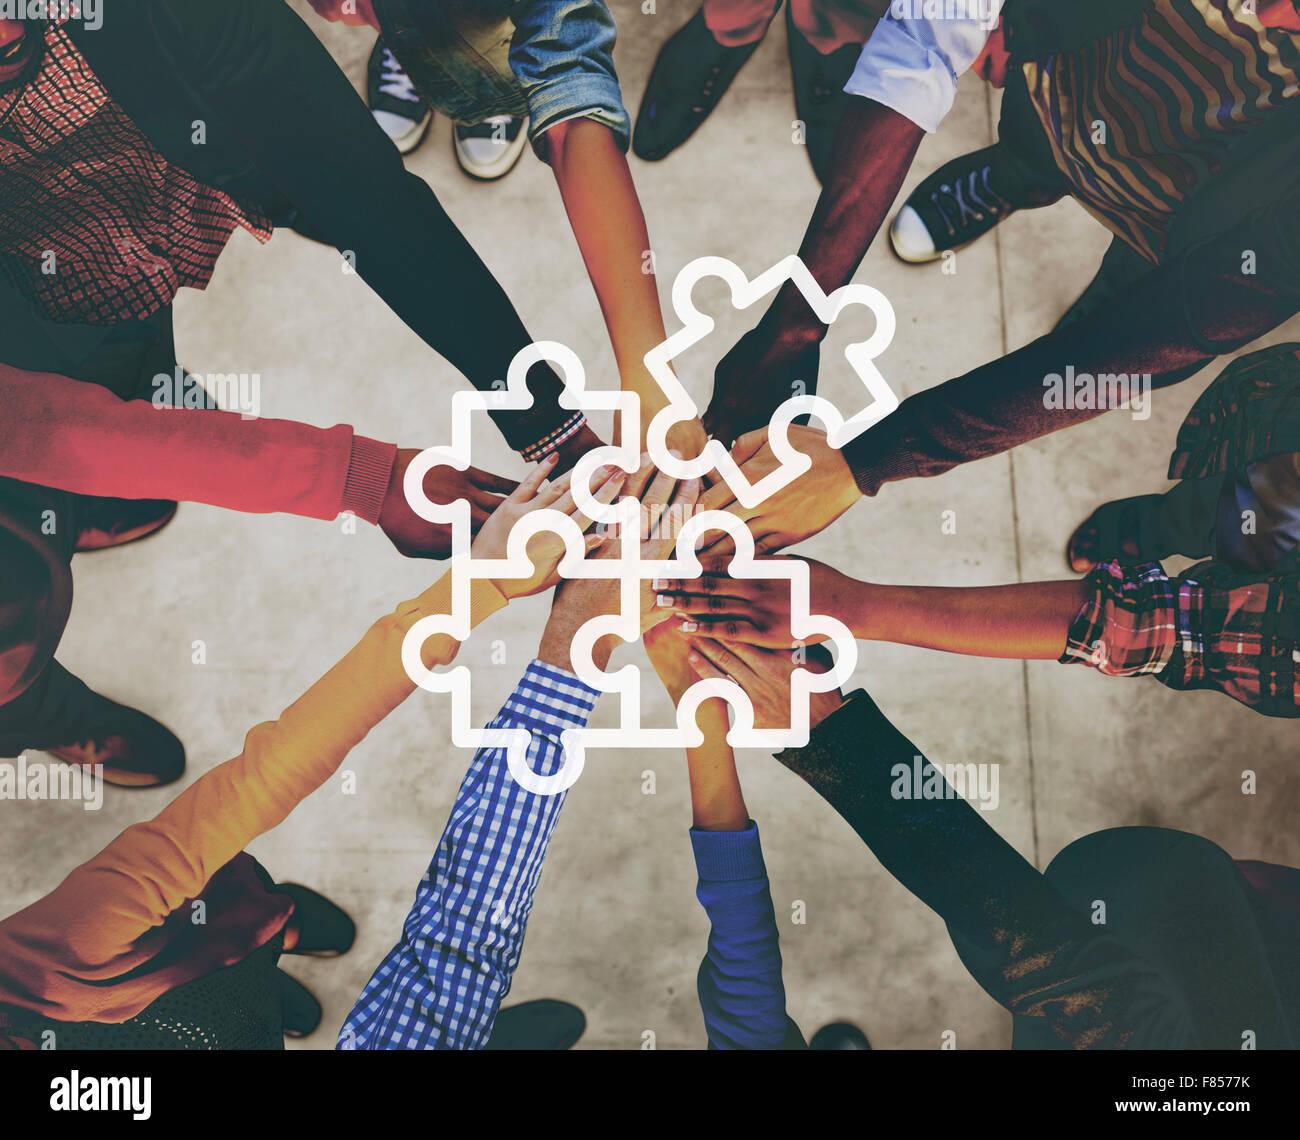 Jigsaw Puzzle-Verbindung Netzwerk Kooperationskonzept Stockbild